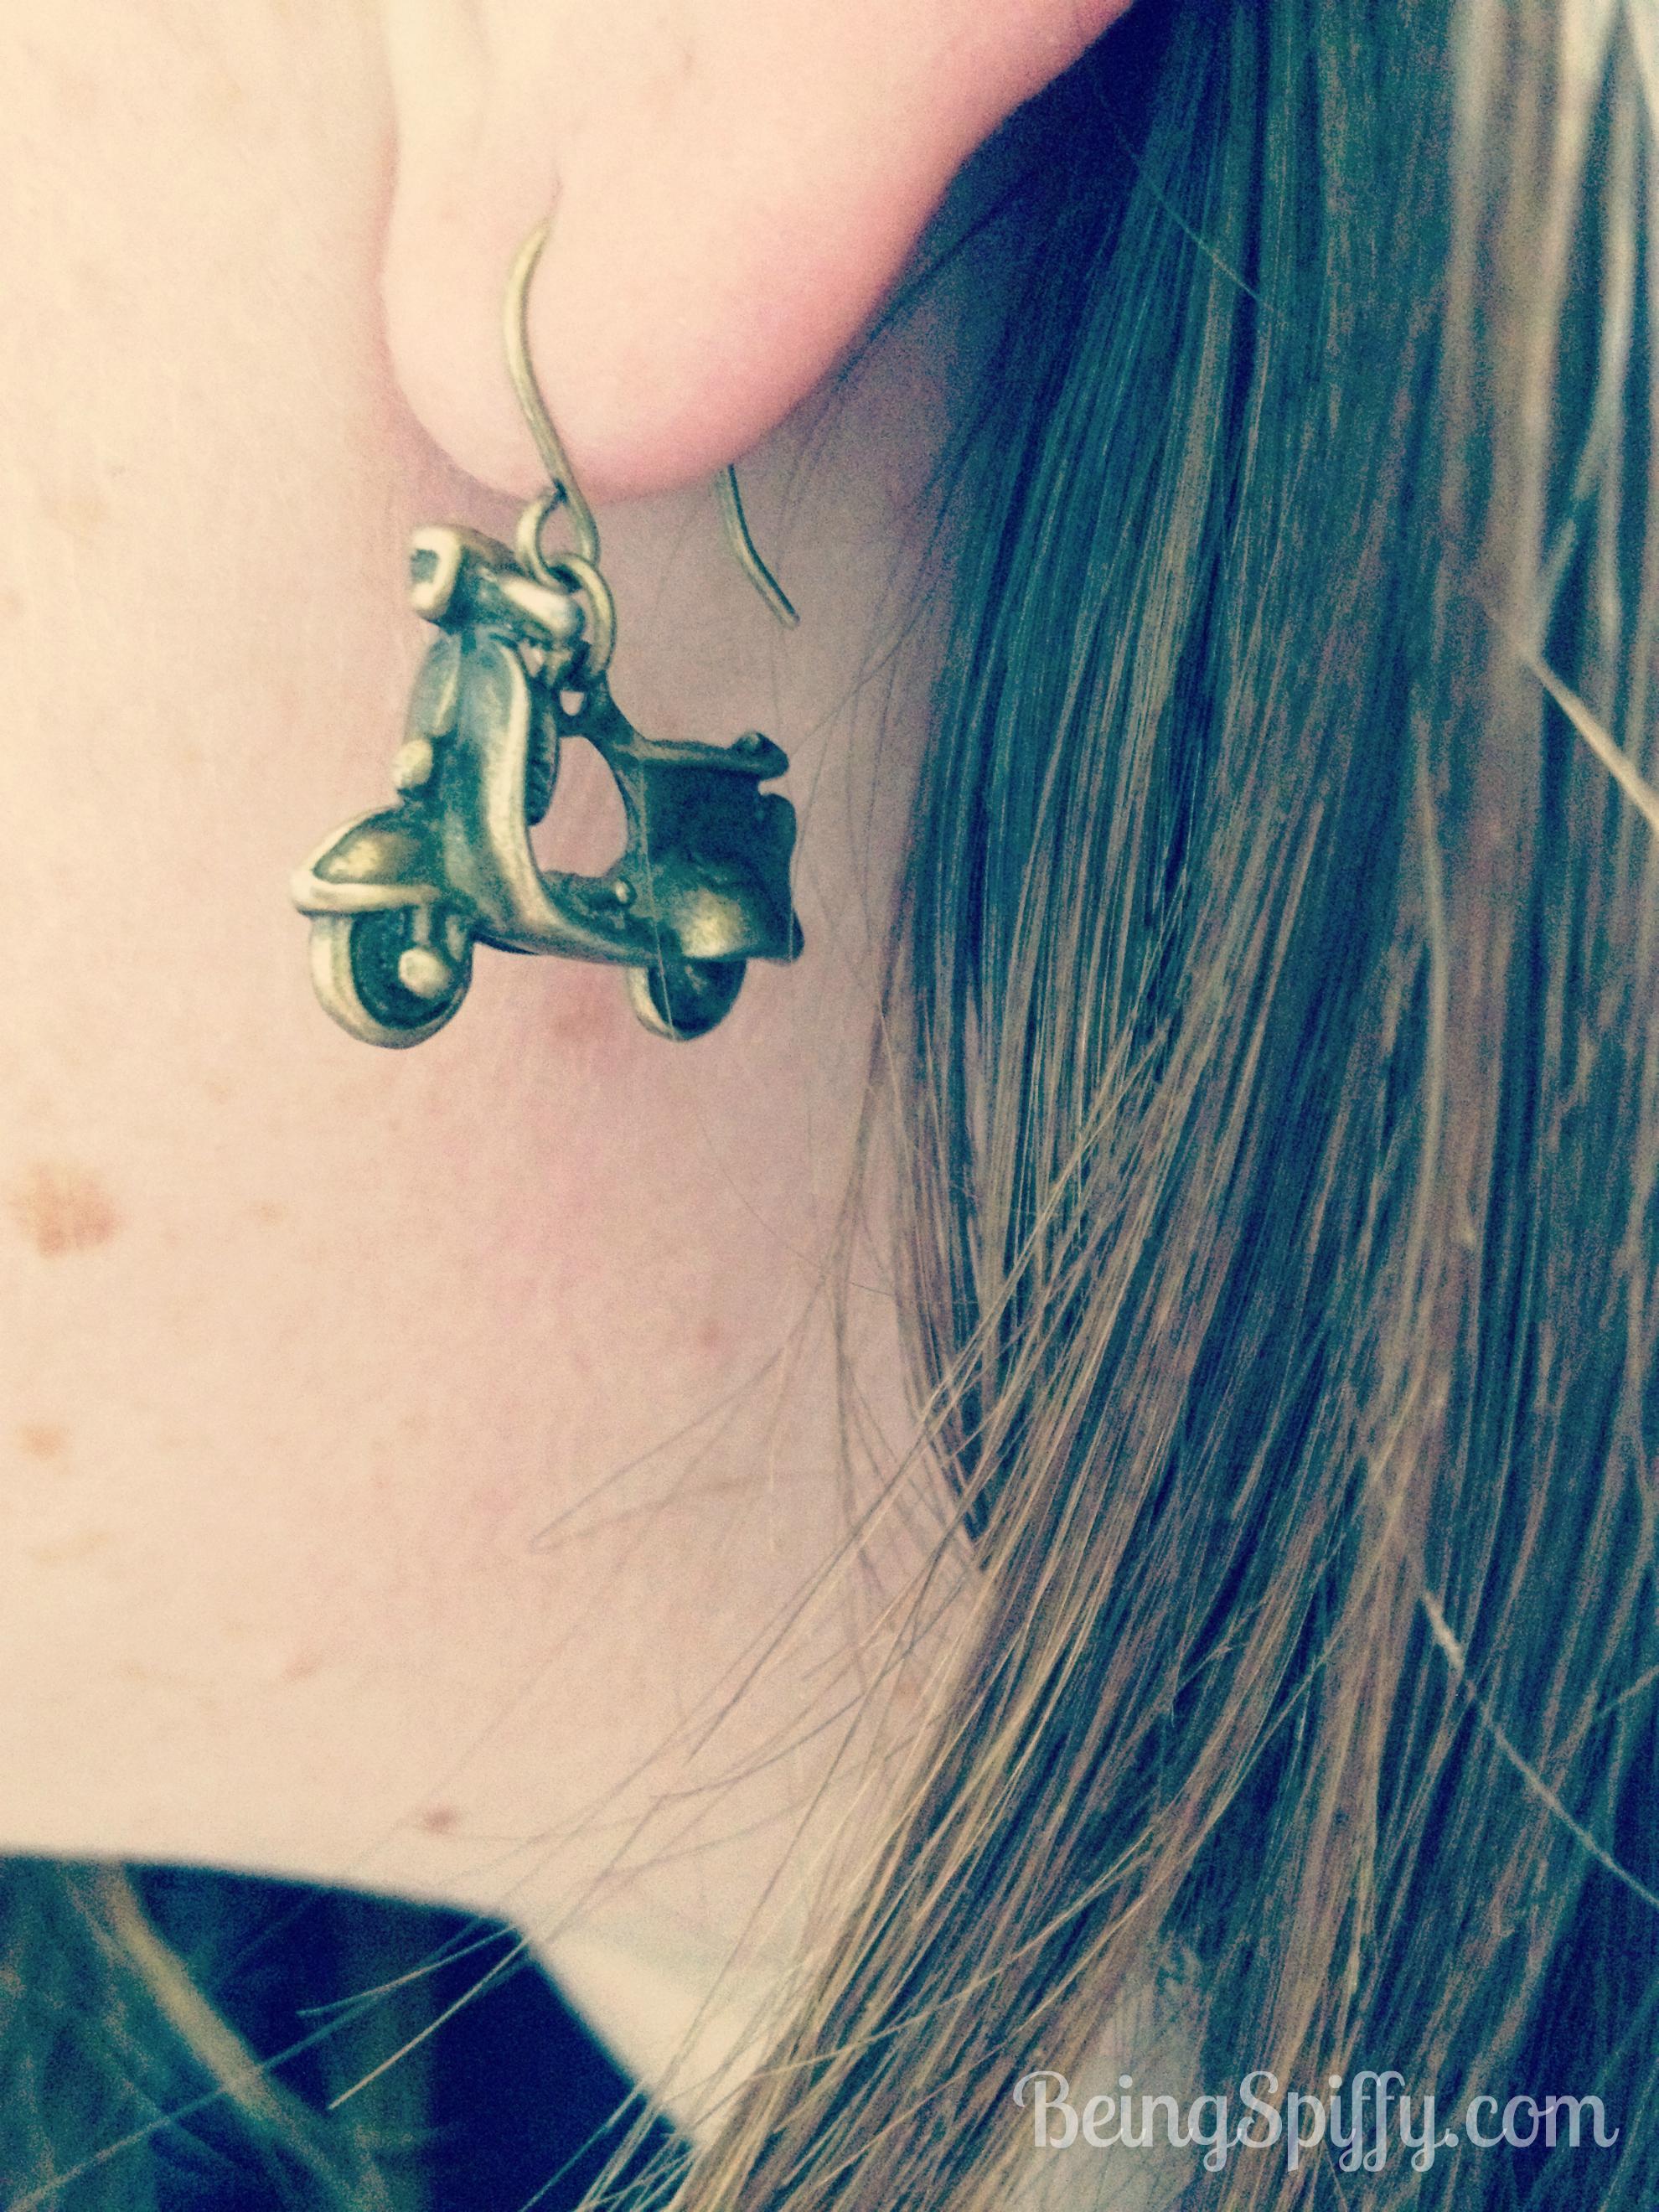 moped_earring.jpg